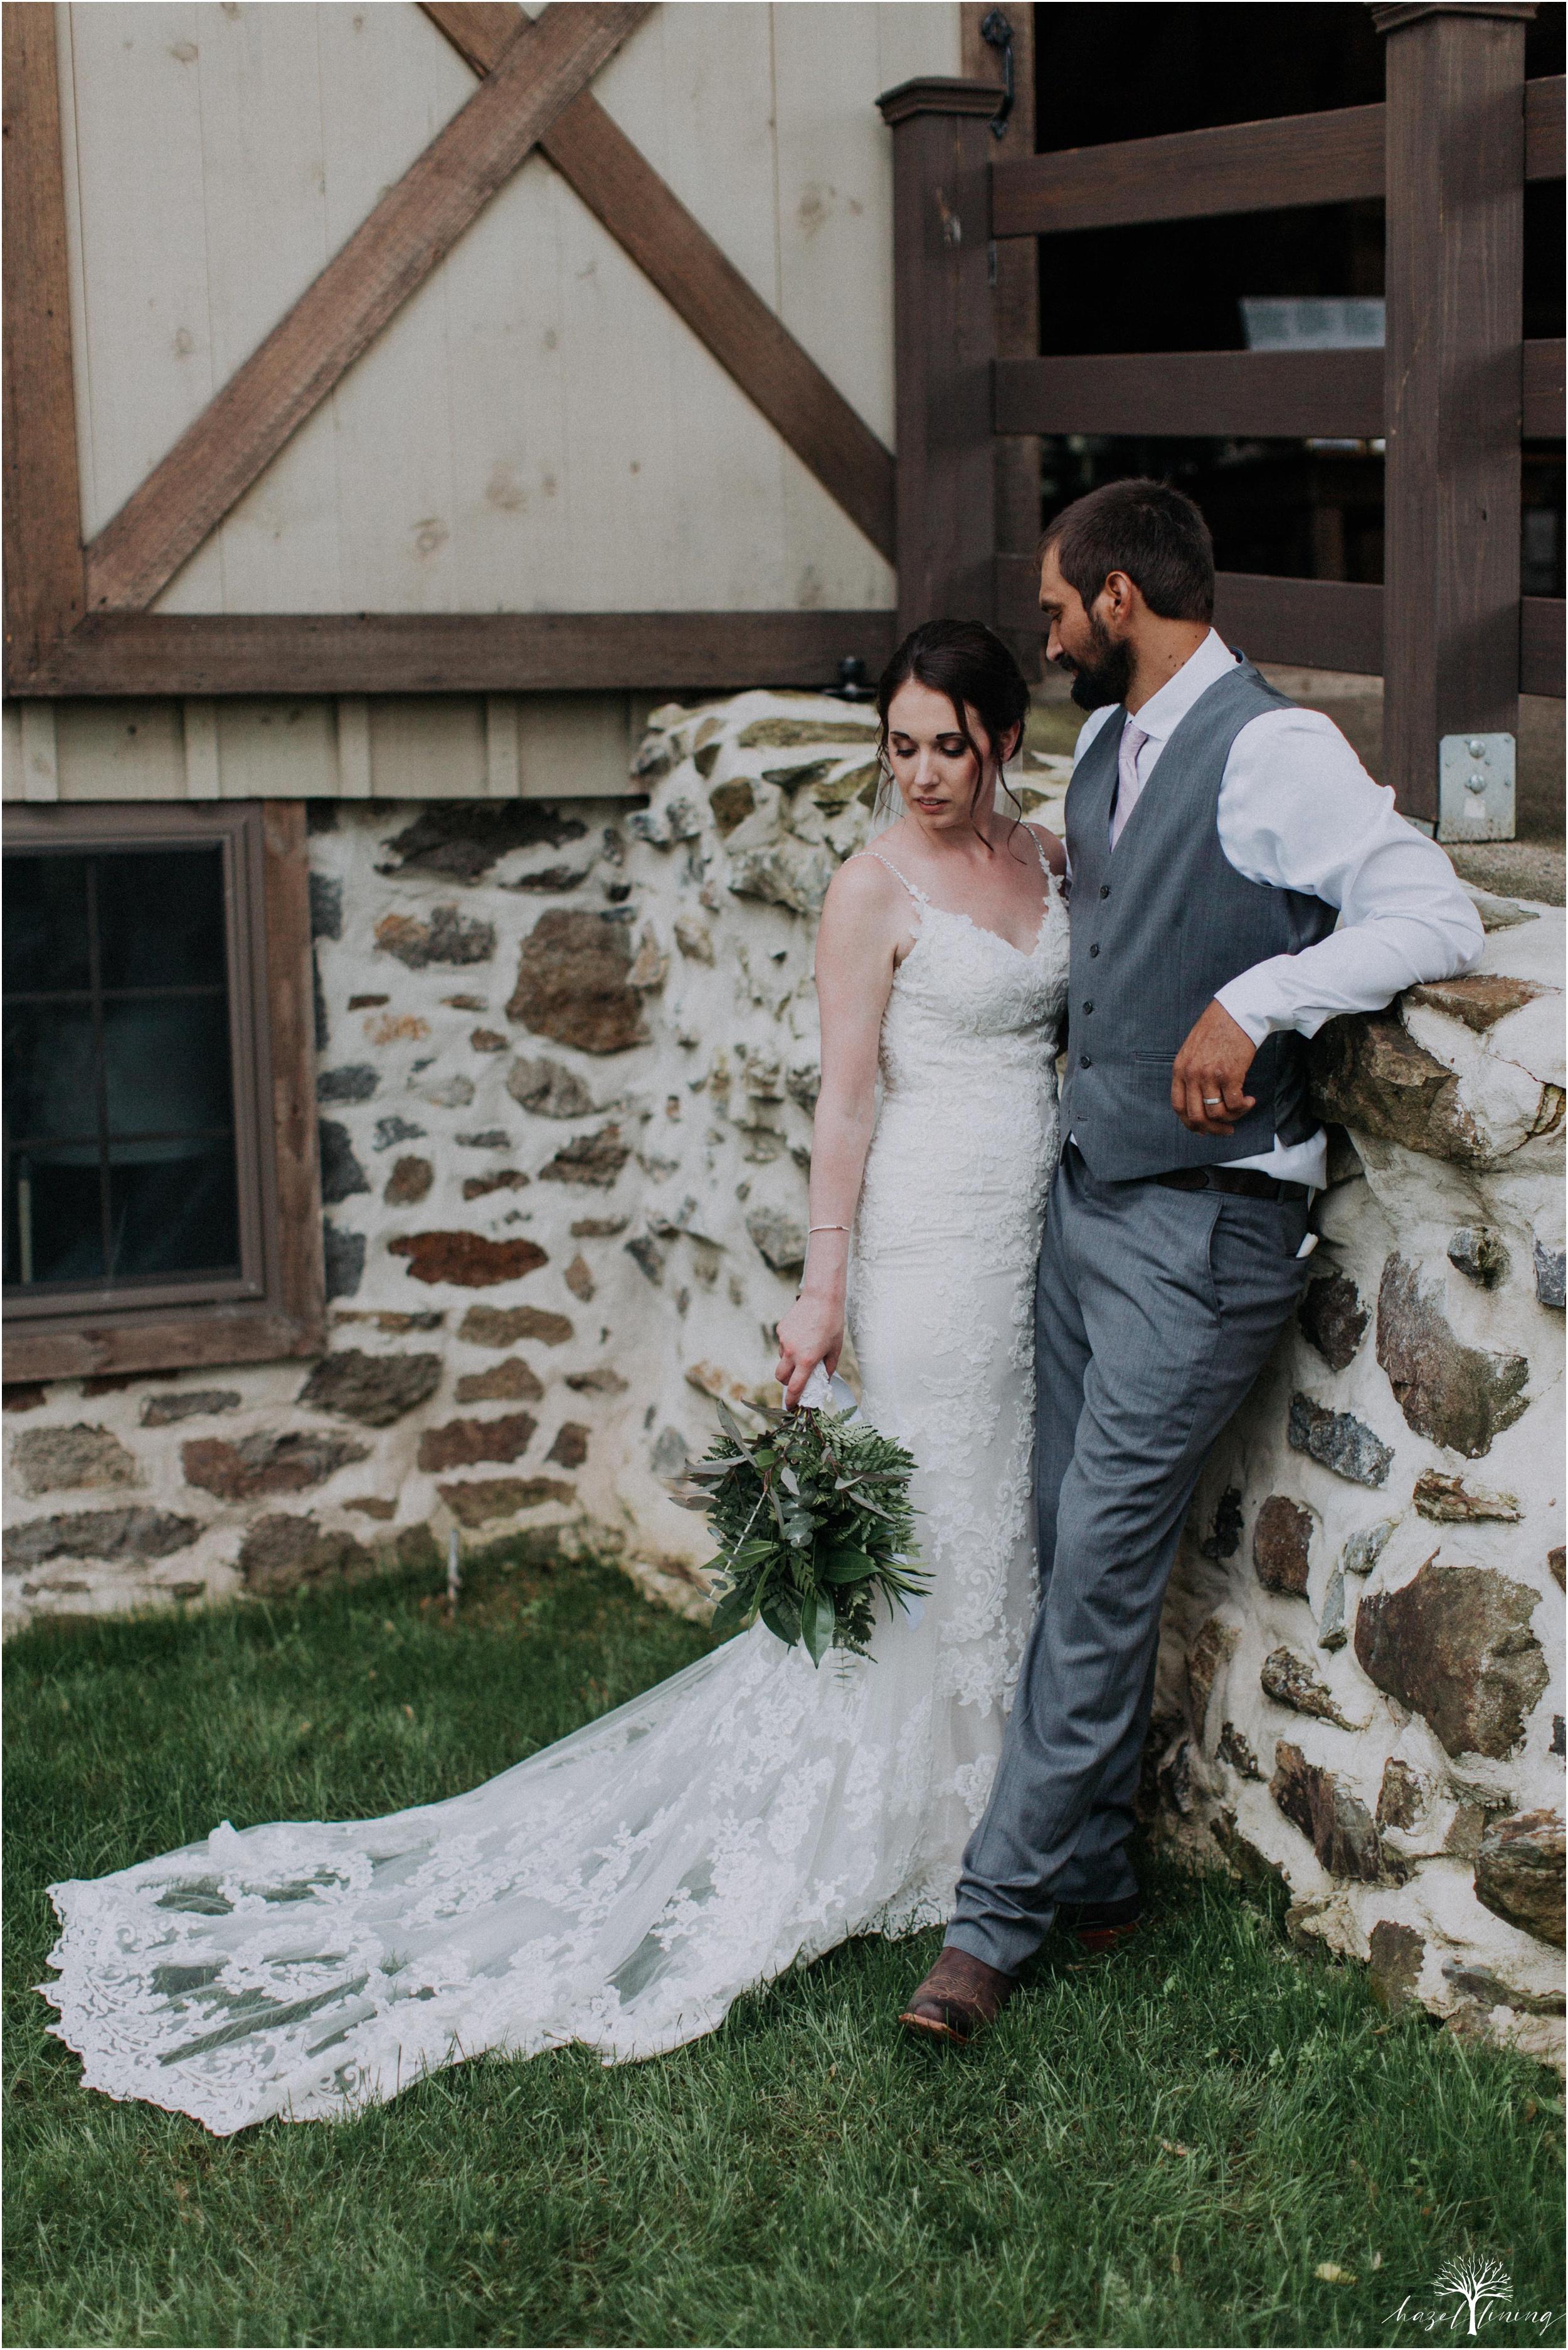 hazel-lining-travel-wedding-elopement-photography-lisa-landon-shoemaker-the-farm-bakery-and-events-bucks-county-quakertown-pennsylvania-summer-country-outdoor-farm-wedding_0100.jpg